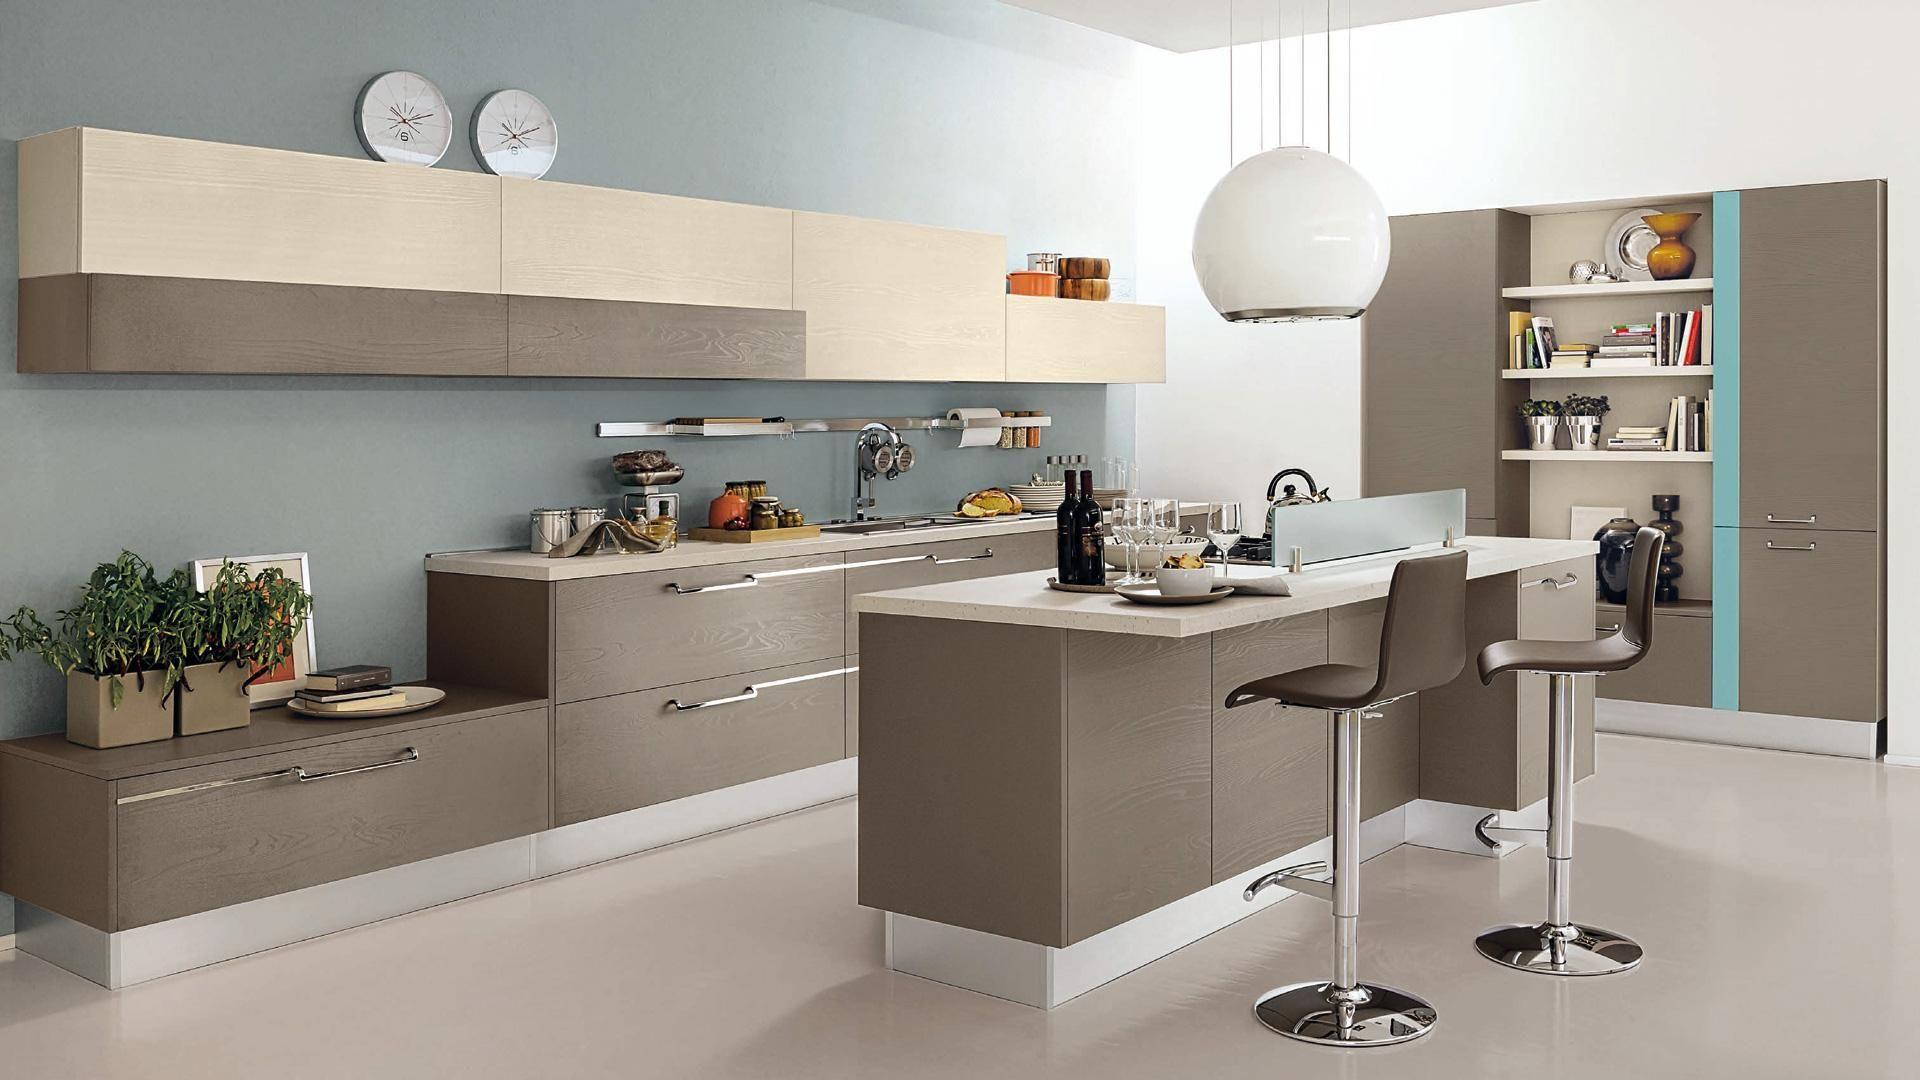 Cucina Lube mod.Immagina Head | Idee per la casa | Pinterest | Cucina